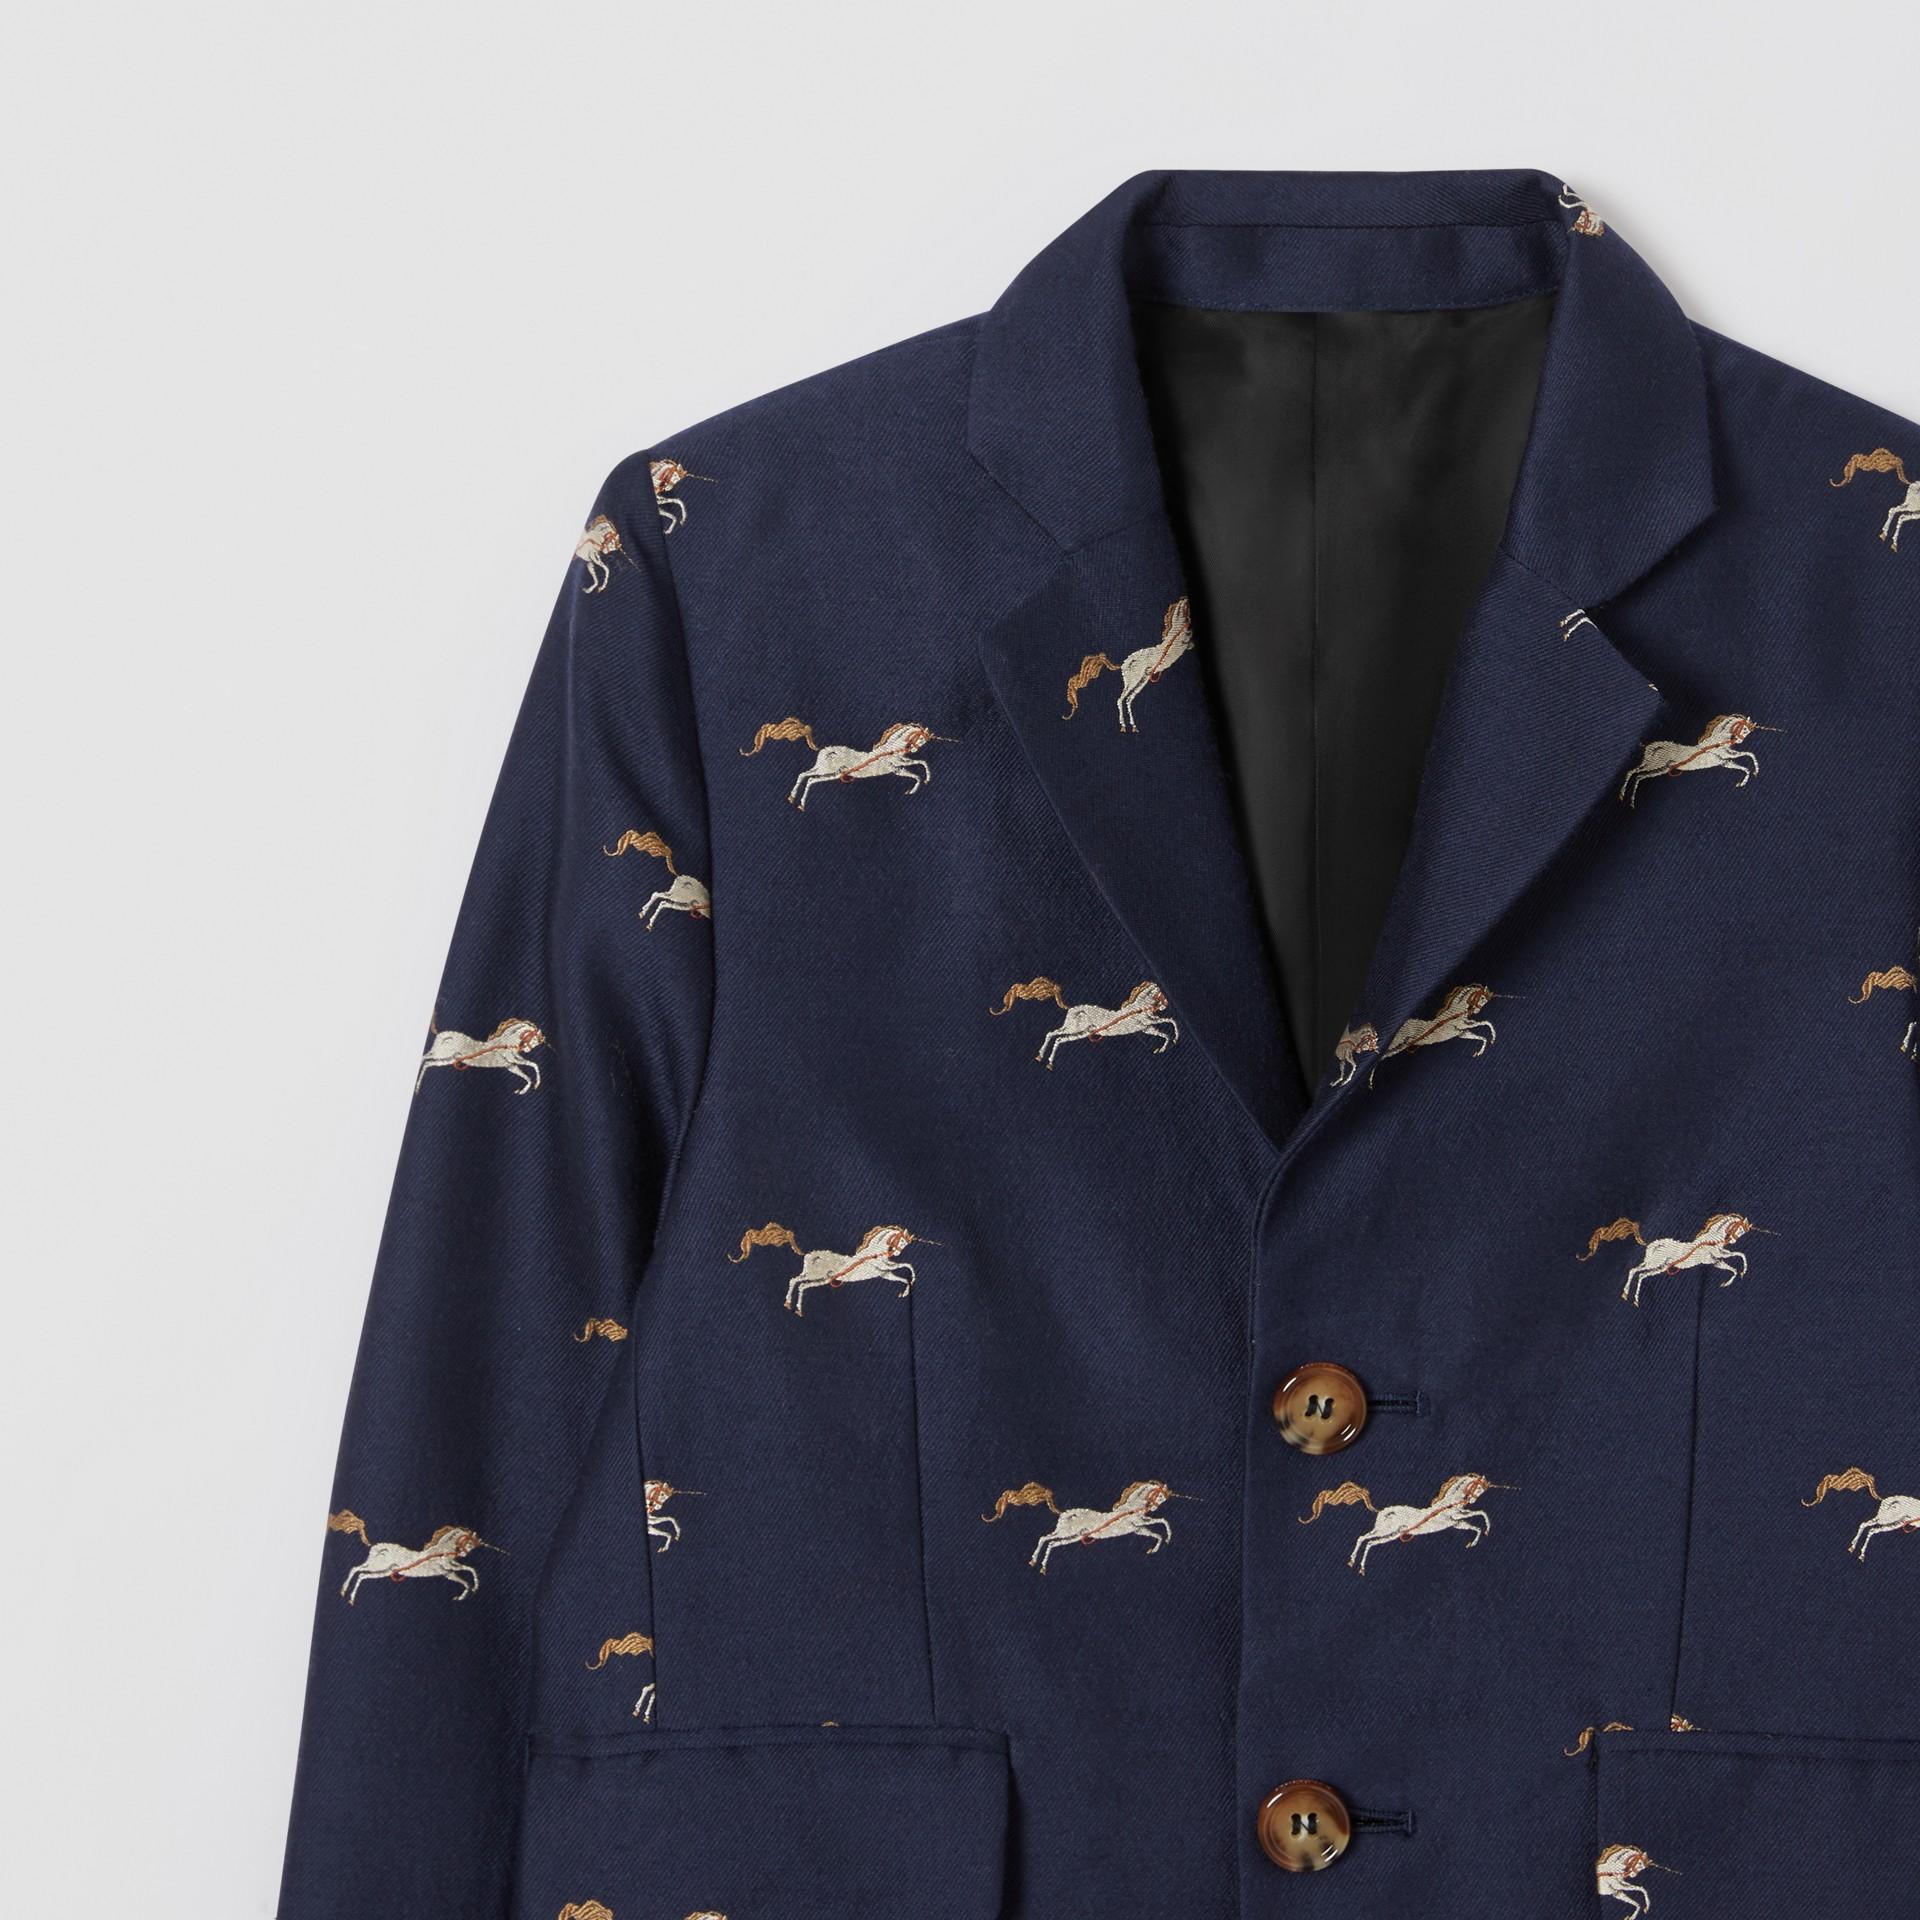 Unicorn Wool Silk Jacquard Blazer in Navy   Burberry United Kingdom - gallery image 4